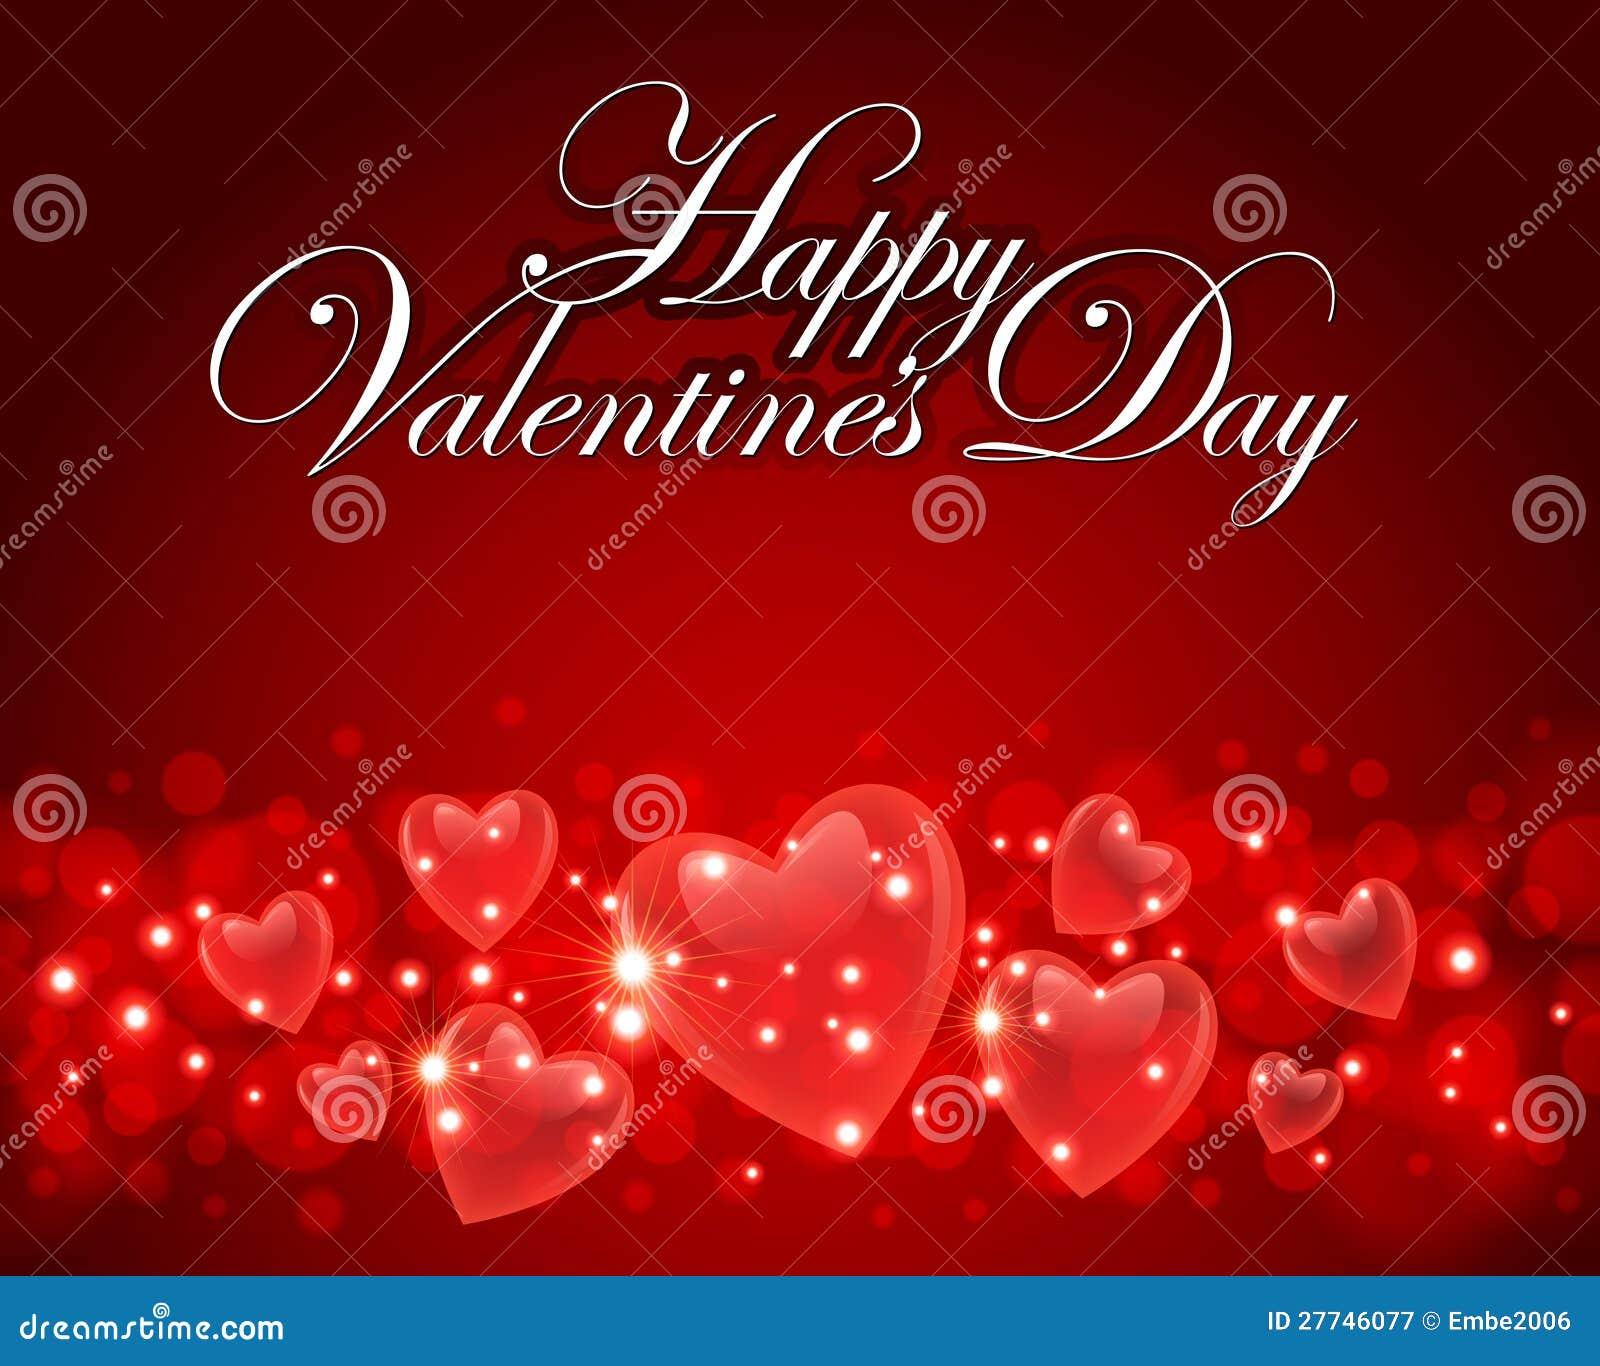 Valentines Background Royalty Free Stock Photography - Image: 27746077